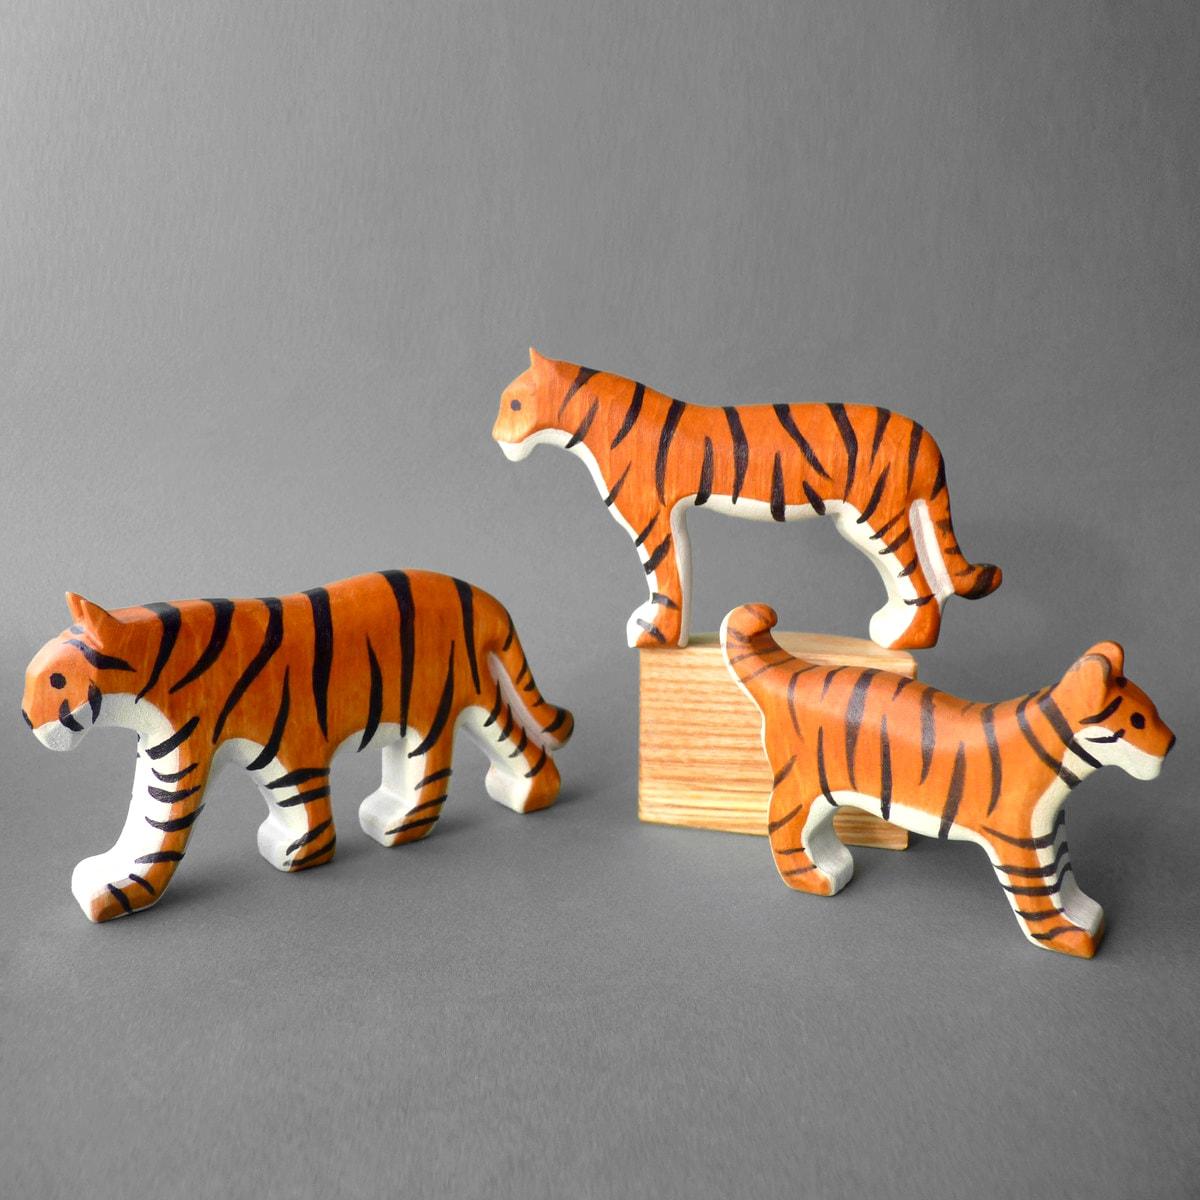 мастер-класс из дерева №14 - тигр из дерева фото 1